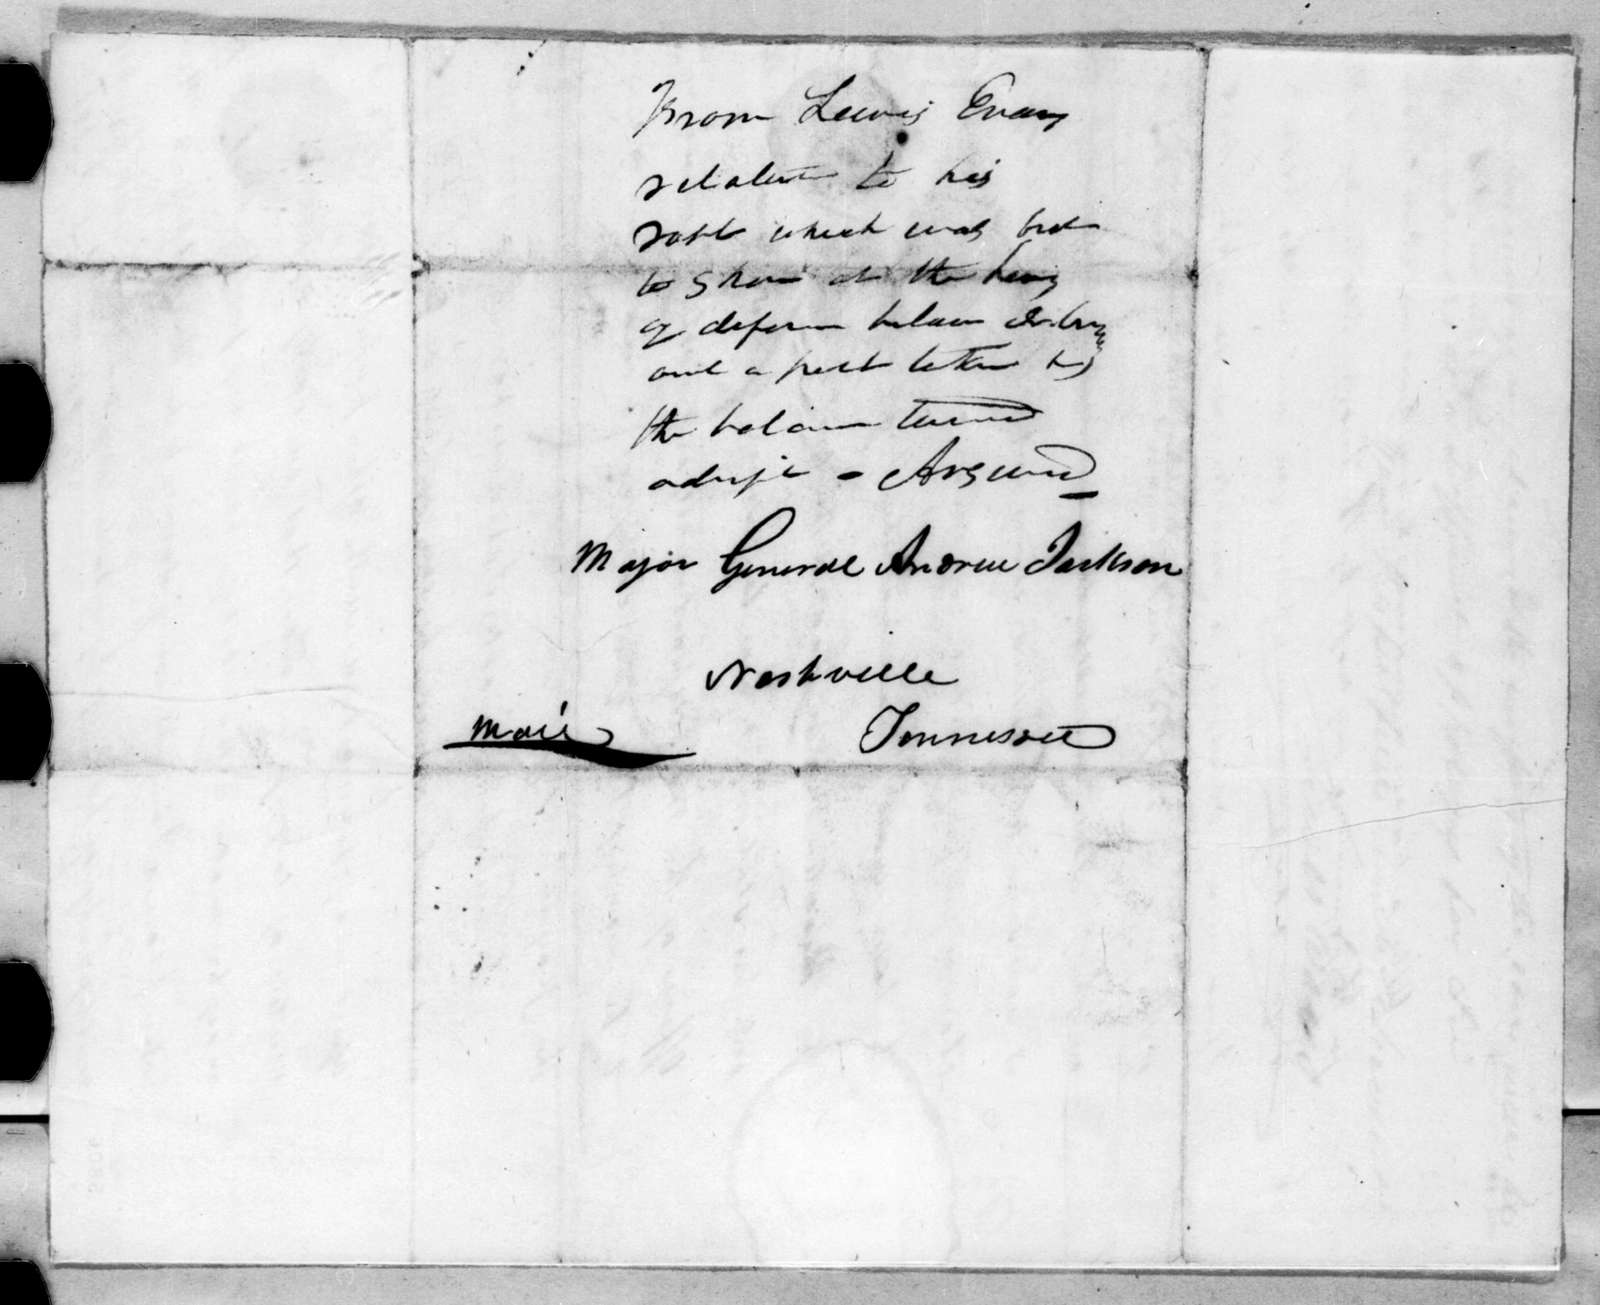 Lewis Evans to Andrew Jackson, September 3, 1816